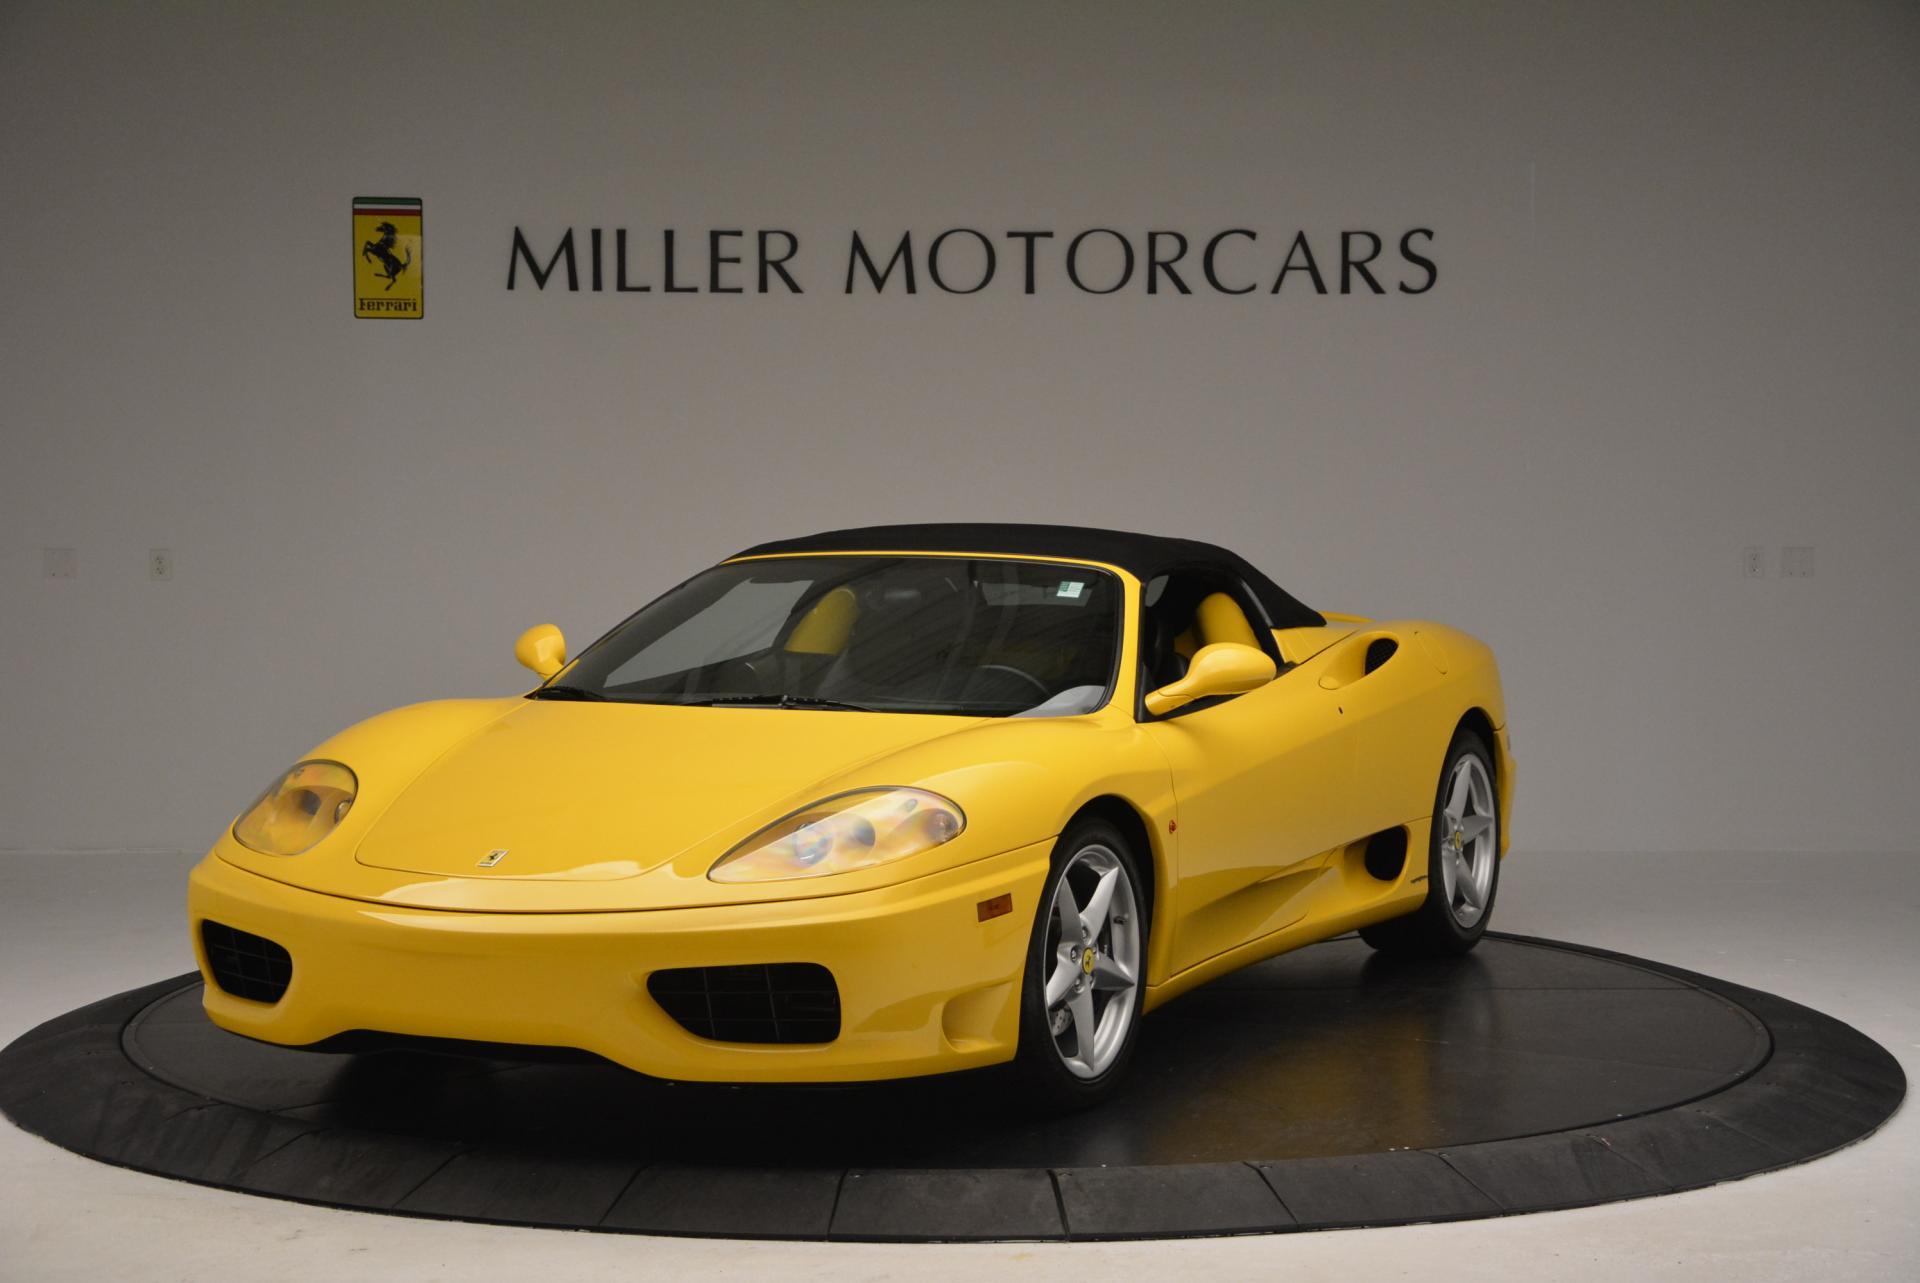 Used 2003 Ferrari 360 Spider 6-Speed Manual  For Sale In Greenwich, CT. Alfa Romeo of Greenwich, 4239A 127_p13